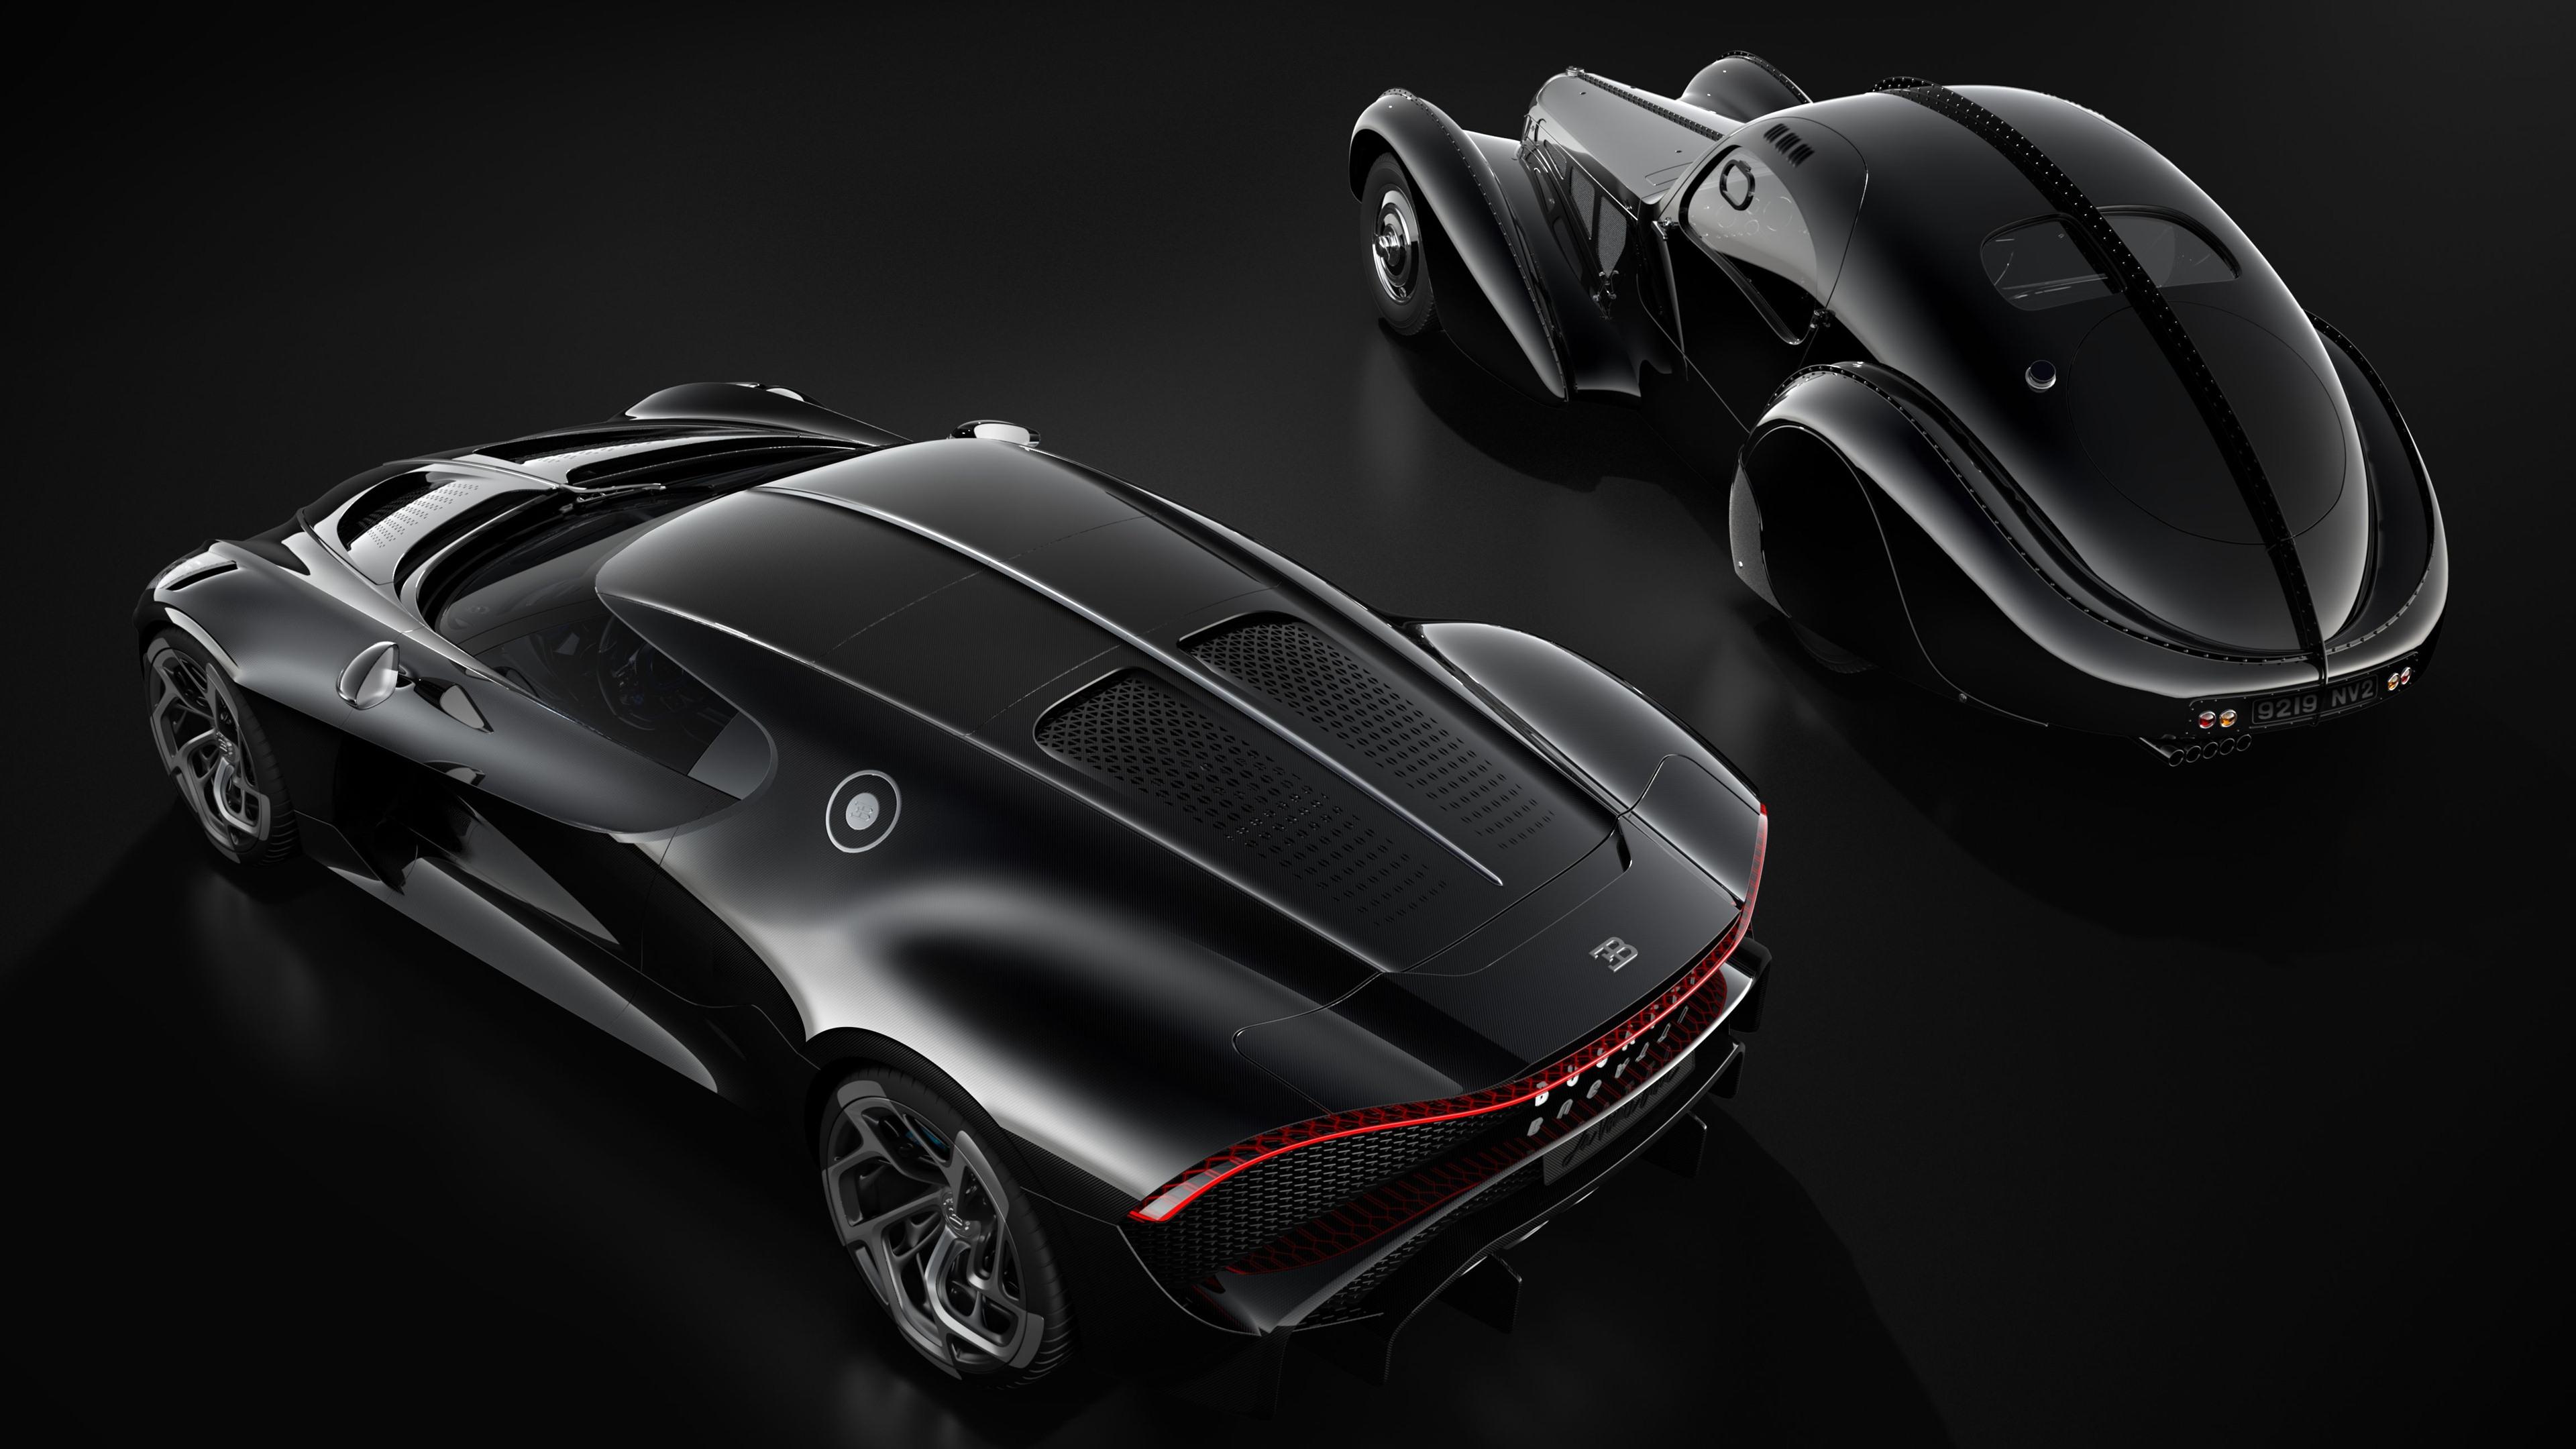 cars wallpaper,automotive design,vehicle,car,supercar,sports car